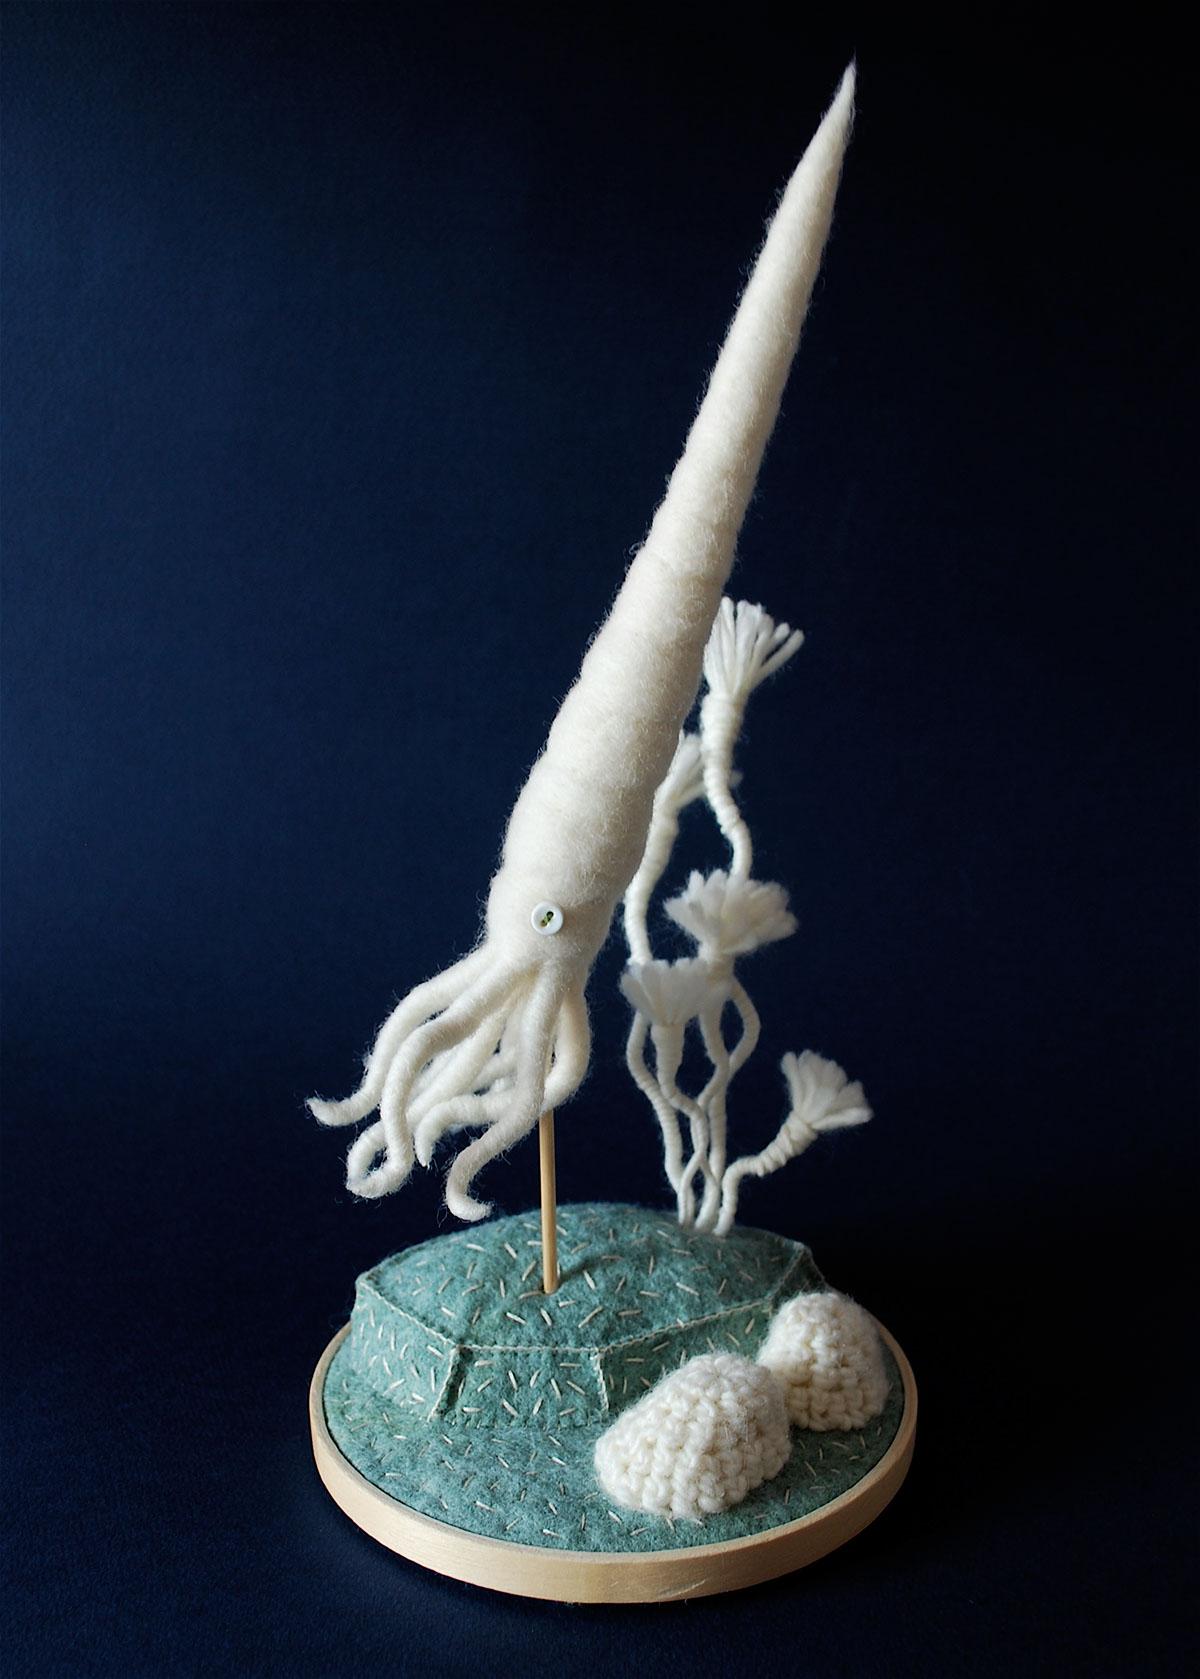 animali-giocattoli-feltro-fatti-mano-hine-mizushima-3